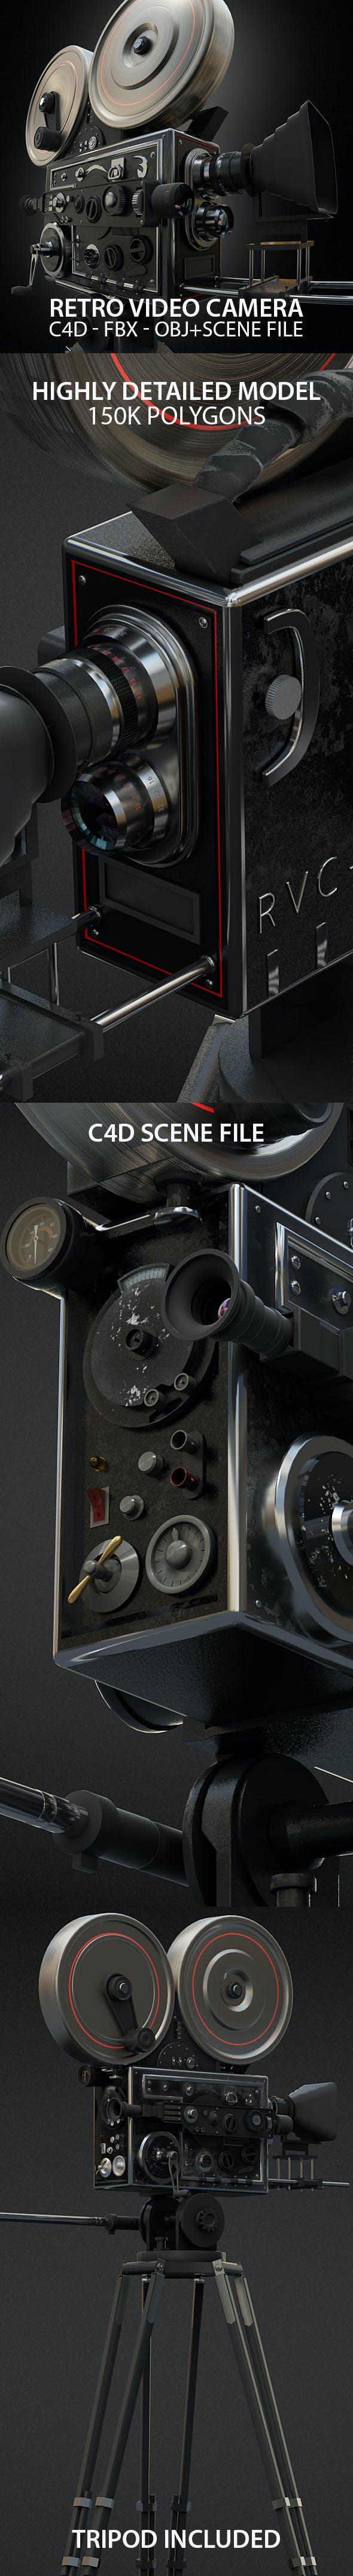 Vintage Video Camera 3D Model with Scene File - 3DOcean Item for Sale